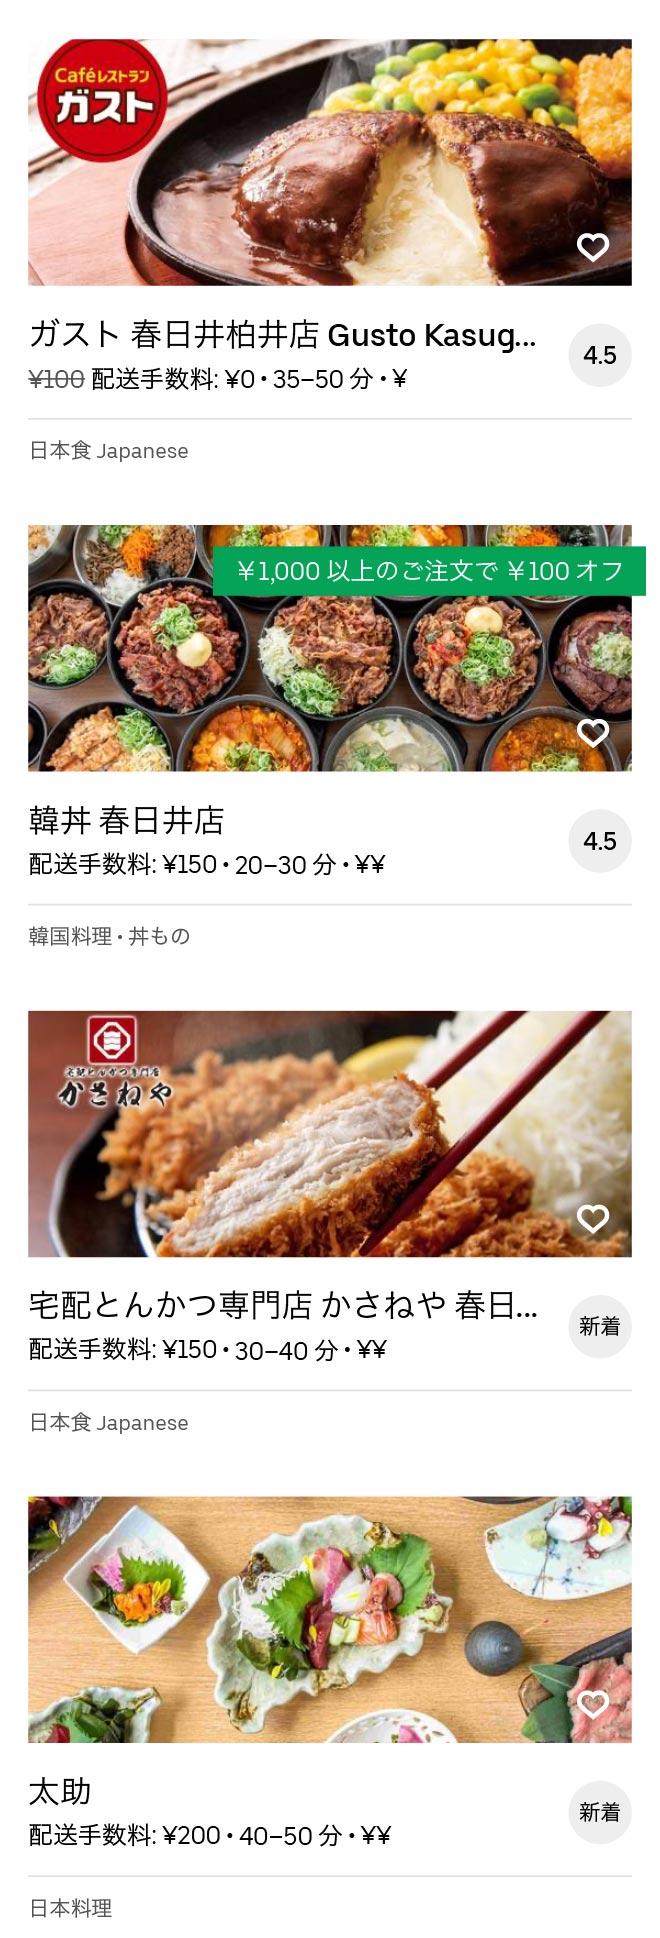 Kachigawa menu 2010 06